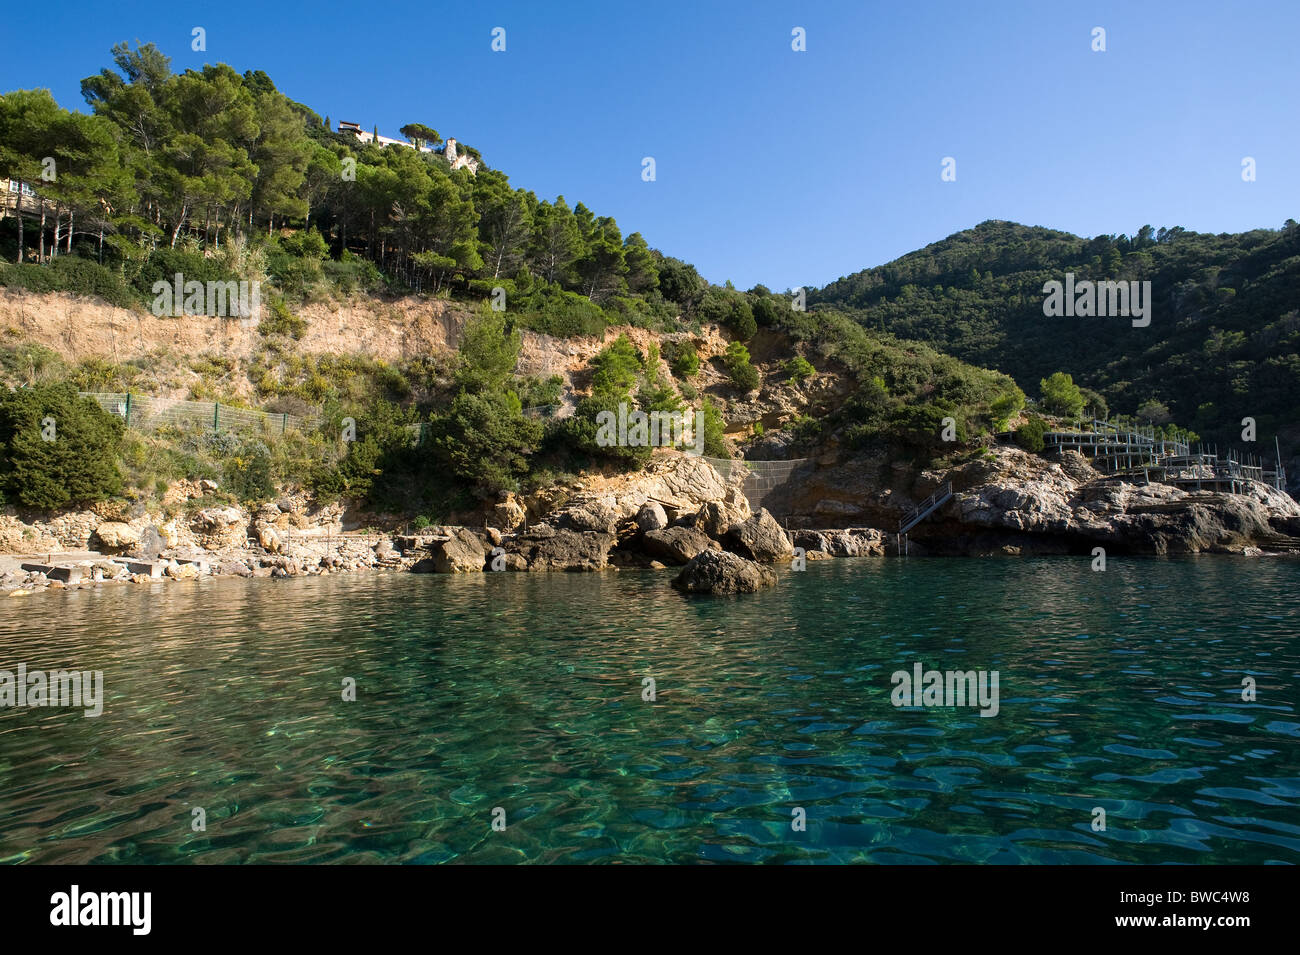 Cala Piccola, Argentario, Grosseto, Tuscany, Italy - Stock Image